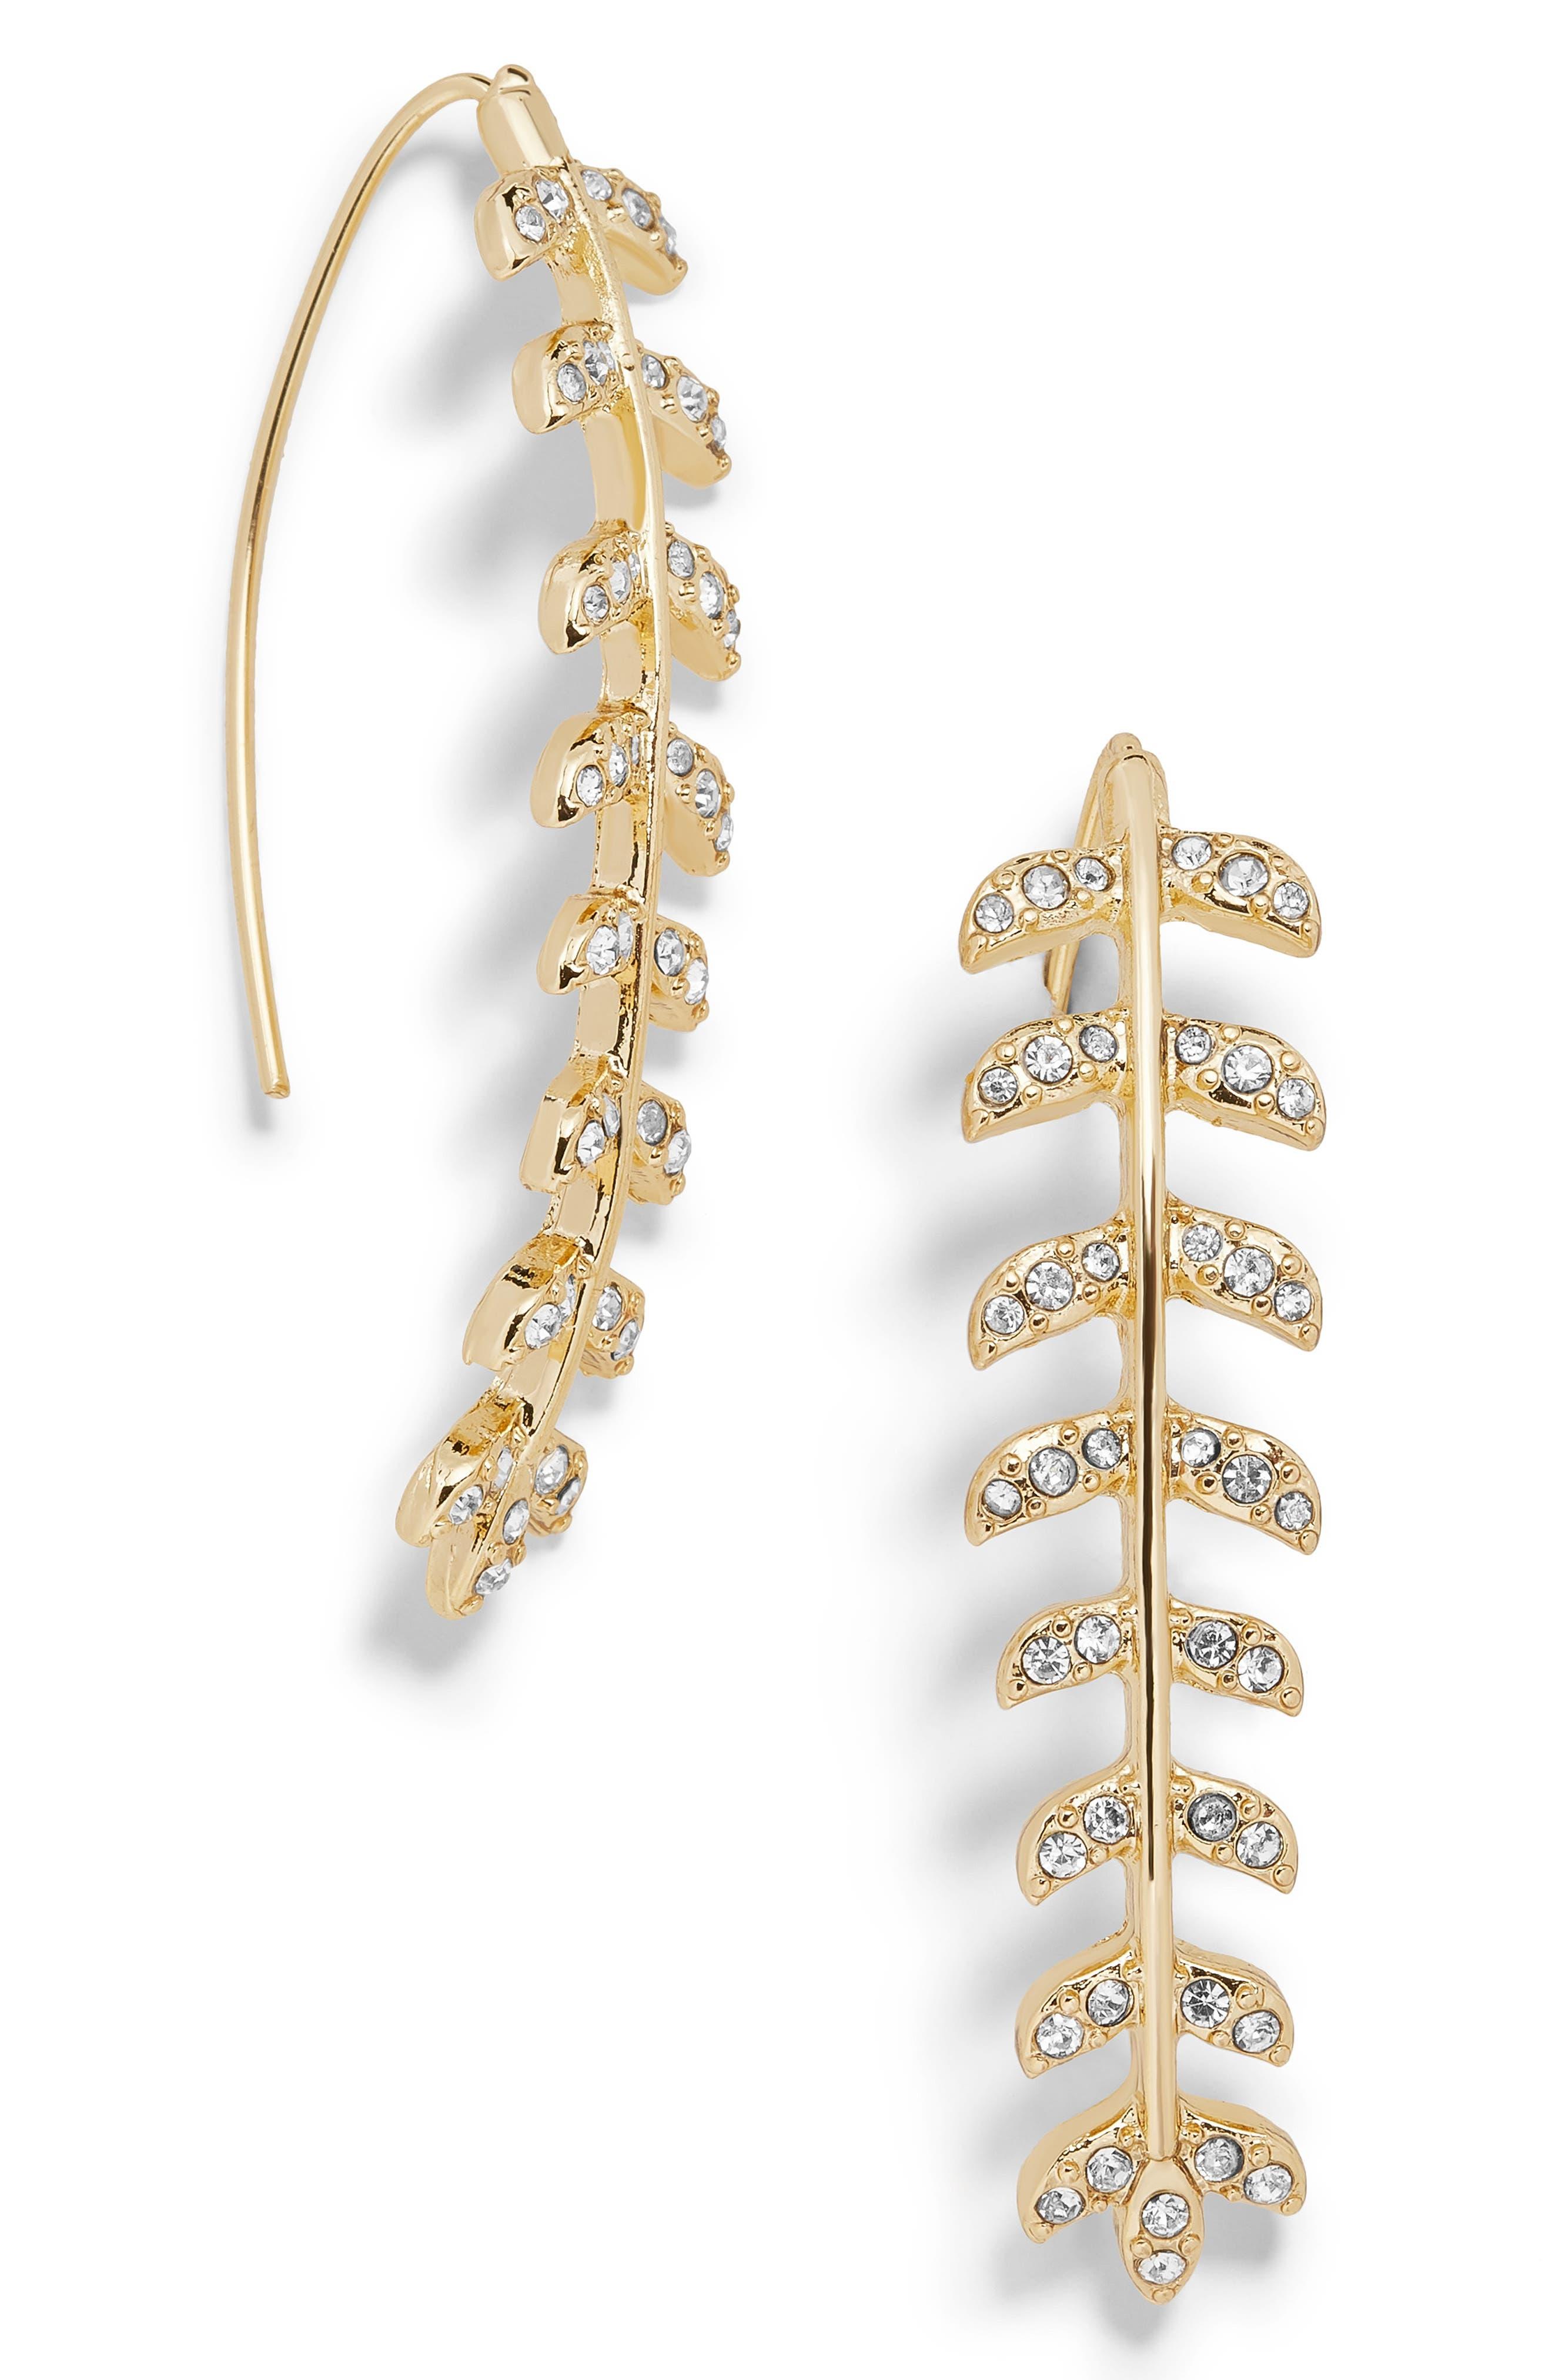 BAUBLEBAR, Celosia Crystal Drop Earrings, Main thumbnail 1, color, GOLD